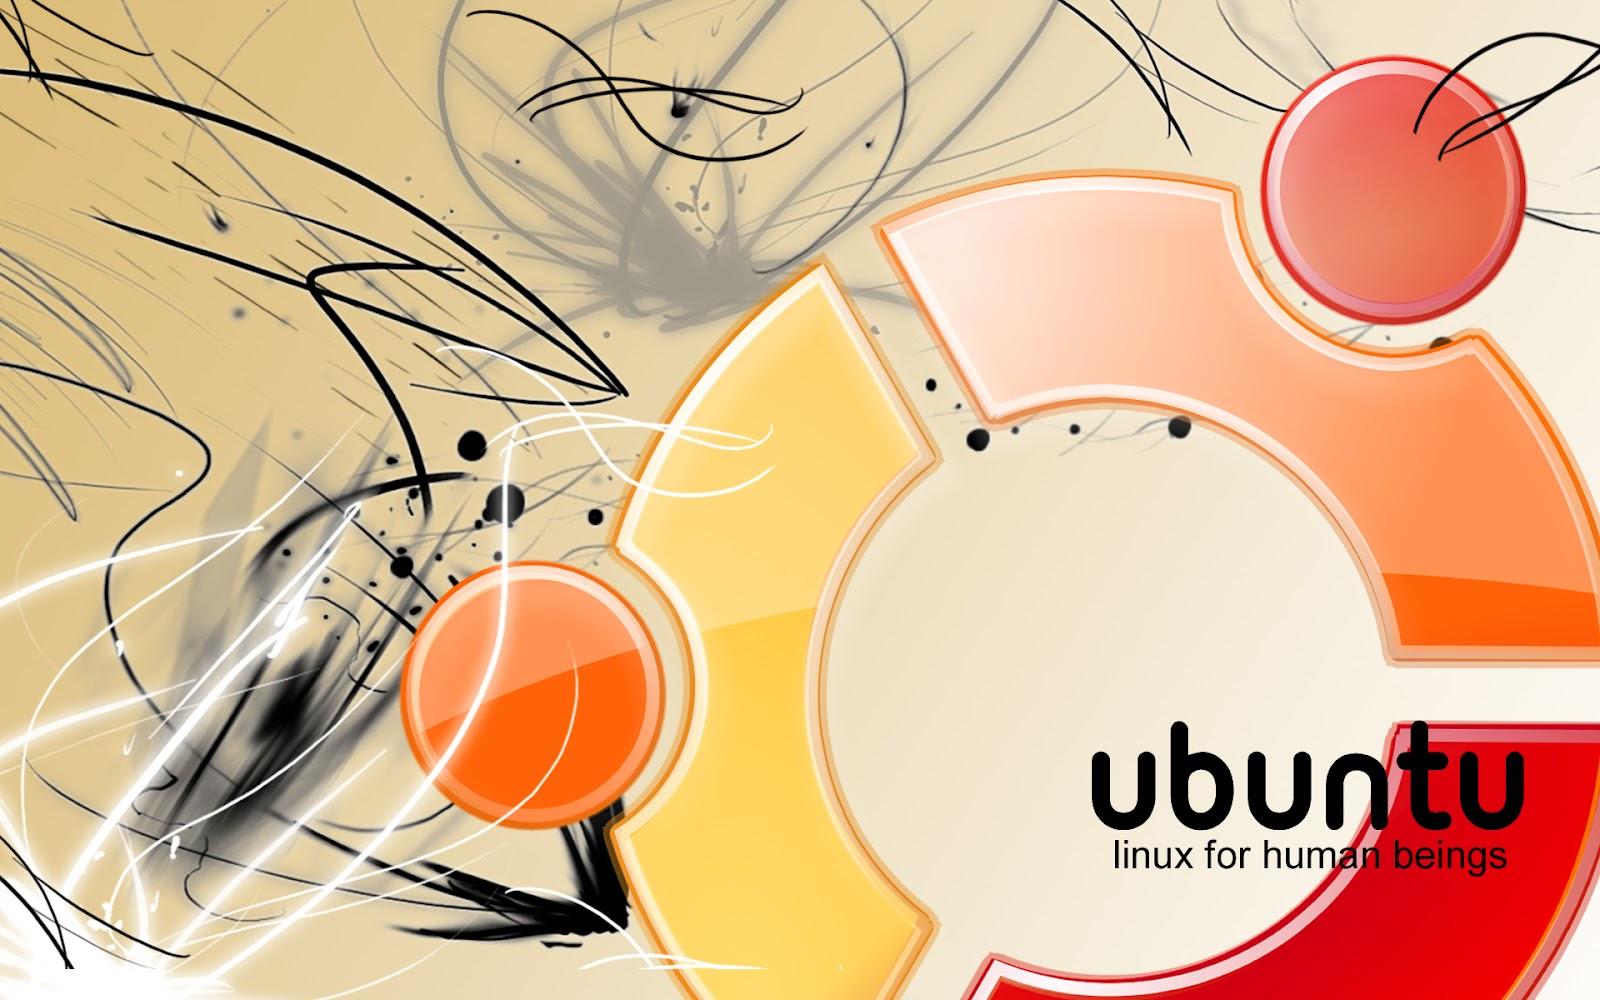 http://1.bp.blogspot.com/-T2bUH0a9ow4/T8gzyD8Hm1I/AAAAAAAAed0/OqbIJZnvZX8/s1600/Logo-Ubuntu-Linux-HD-Wallpapers.jpg